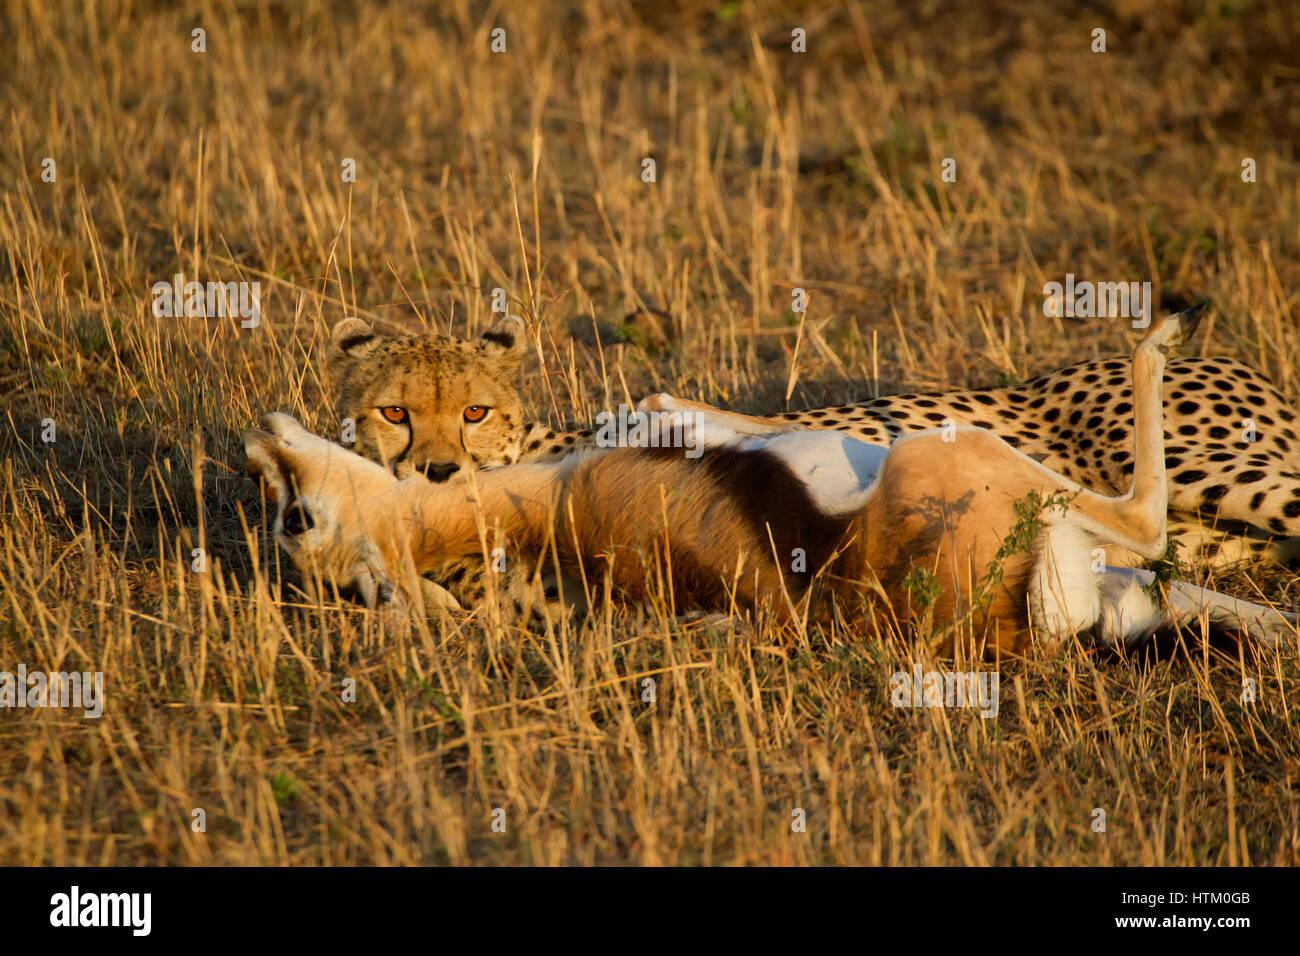 Le Guépard (Acinonyx jubatus) avec son kill, Masai Mara National Reserve, Kenya, Afrique de l'Est Photo Stock